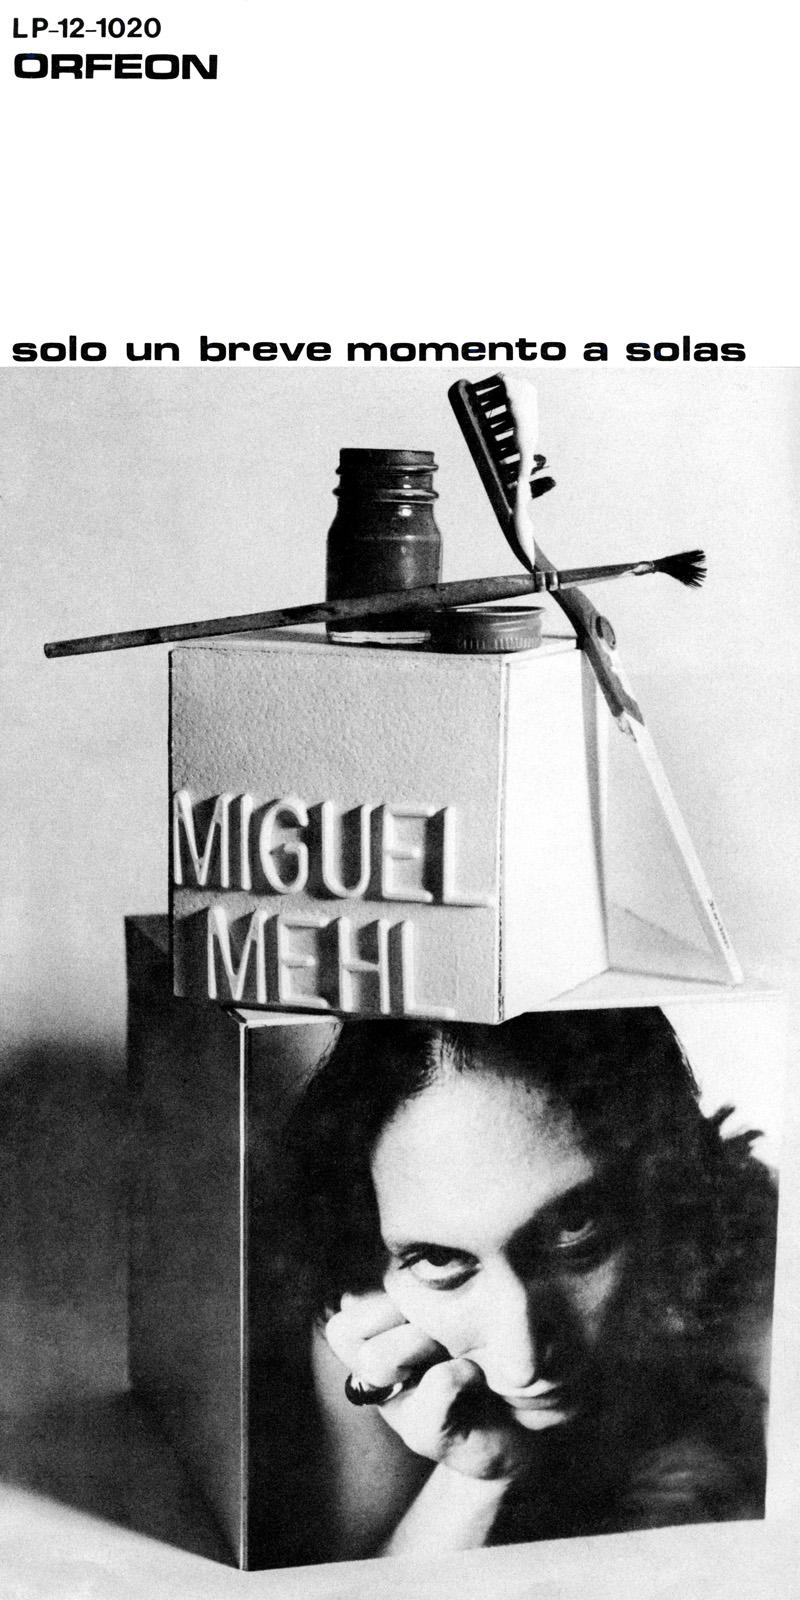 1976_Michael-Mehl_Orfeon-LP-12-1020-Poster